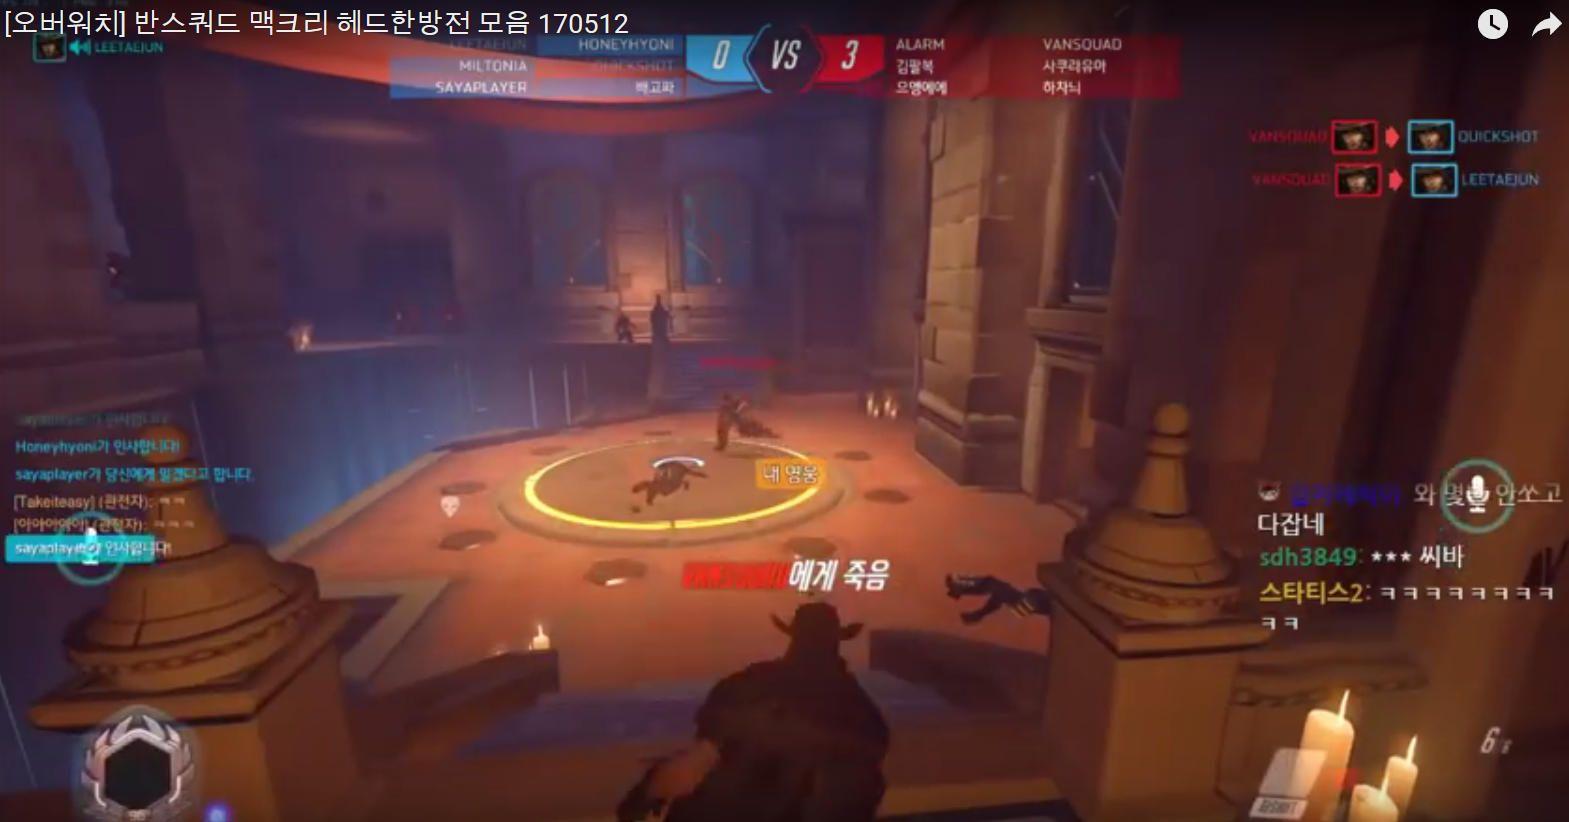 Korean amateur video